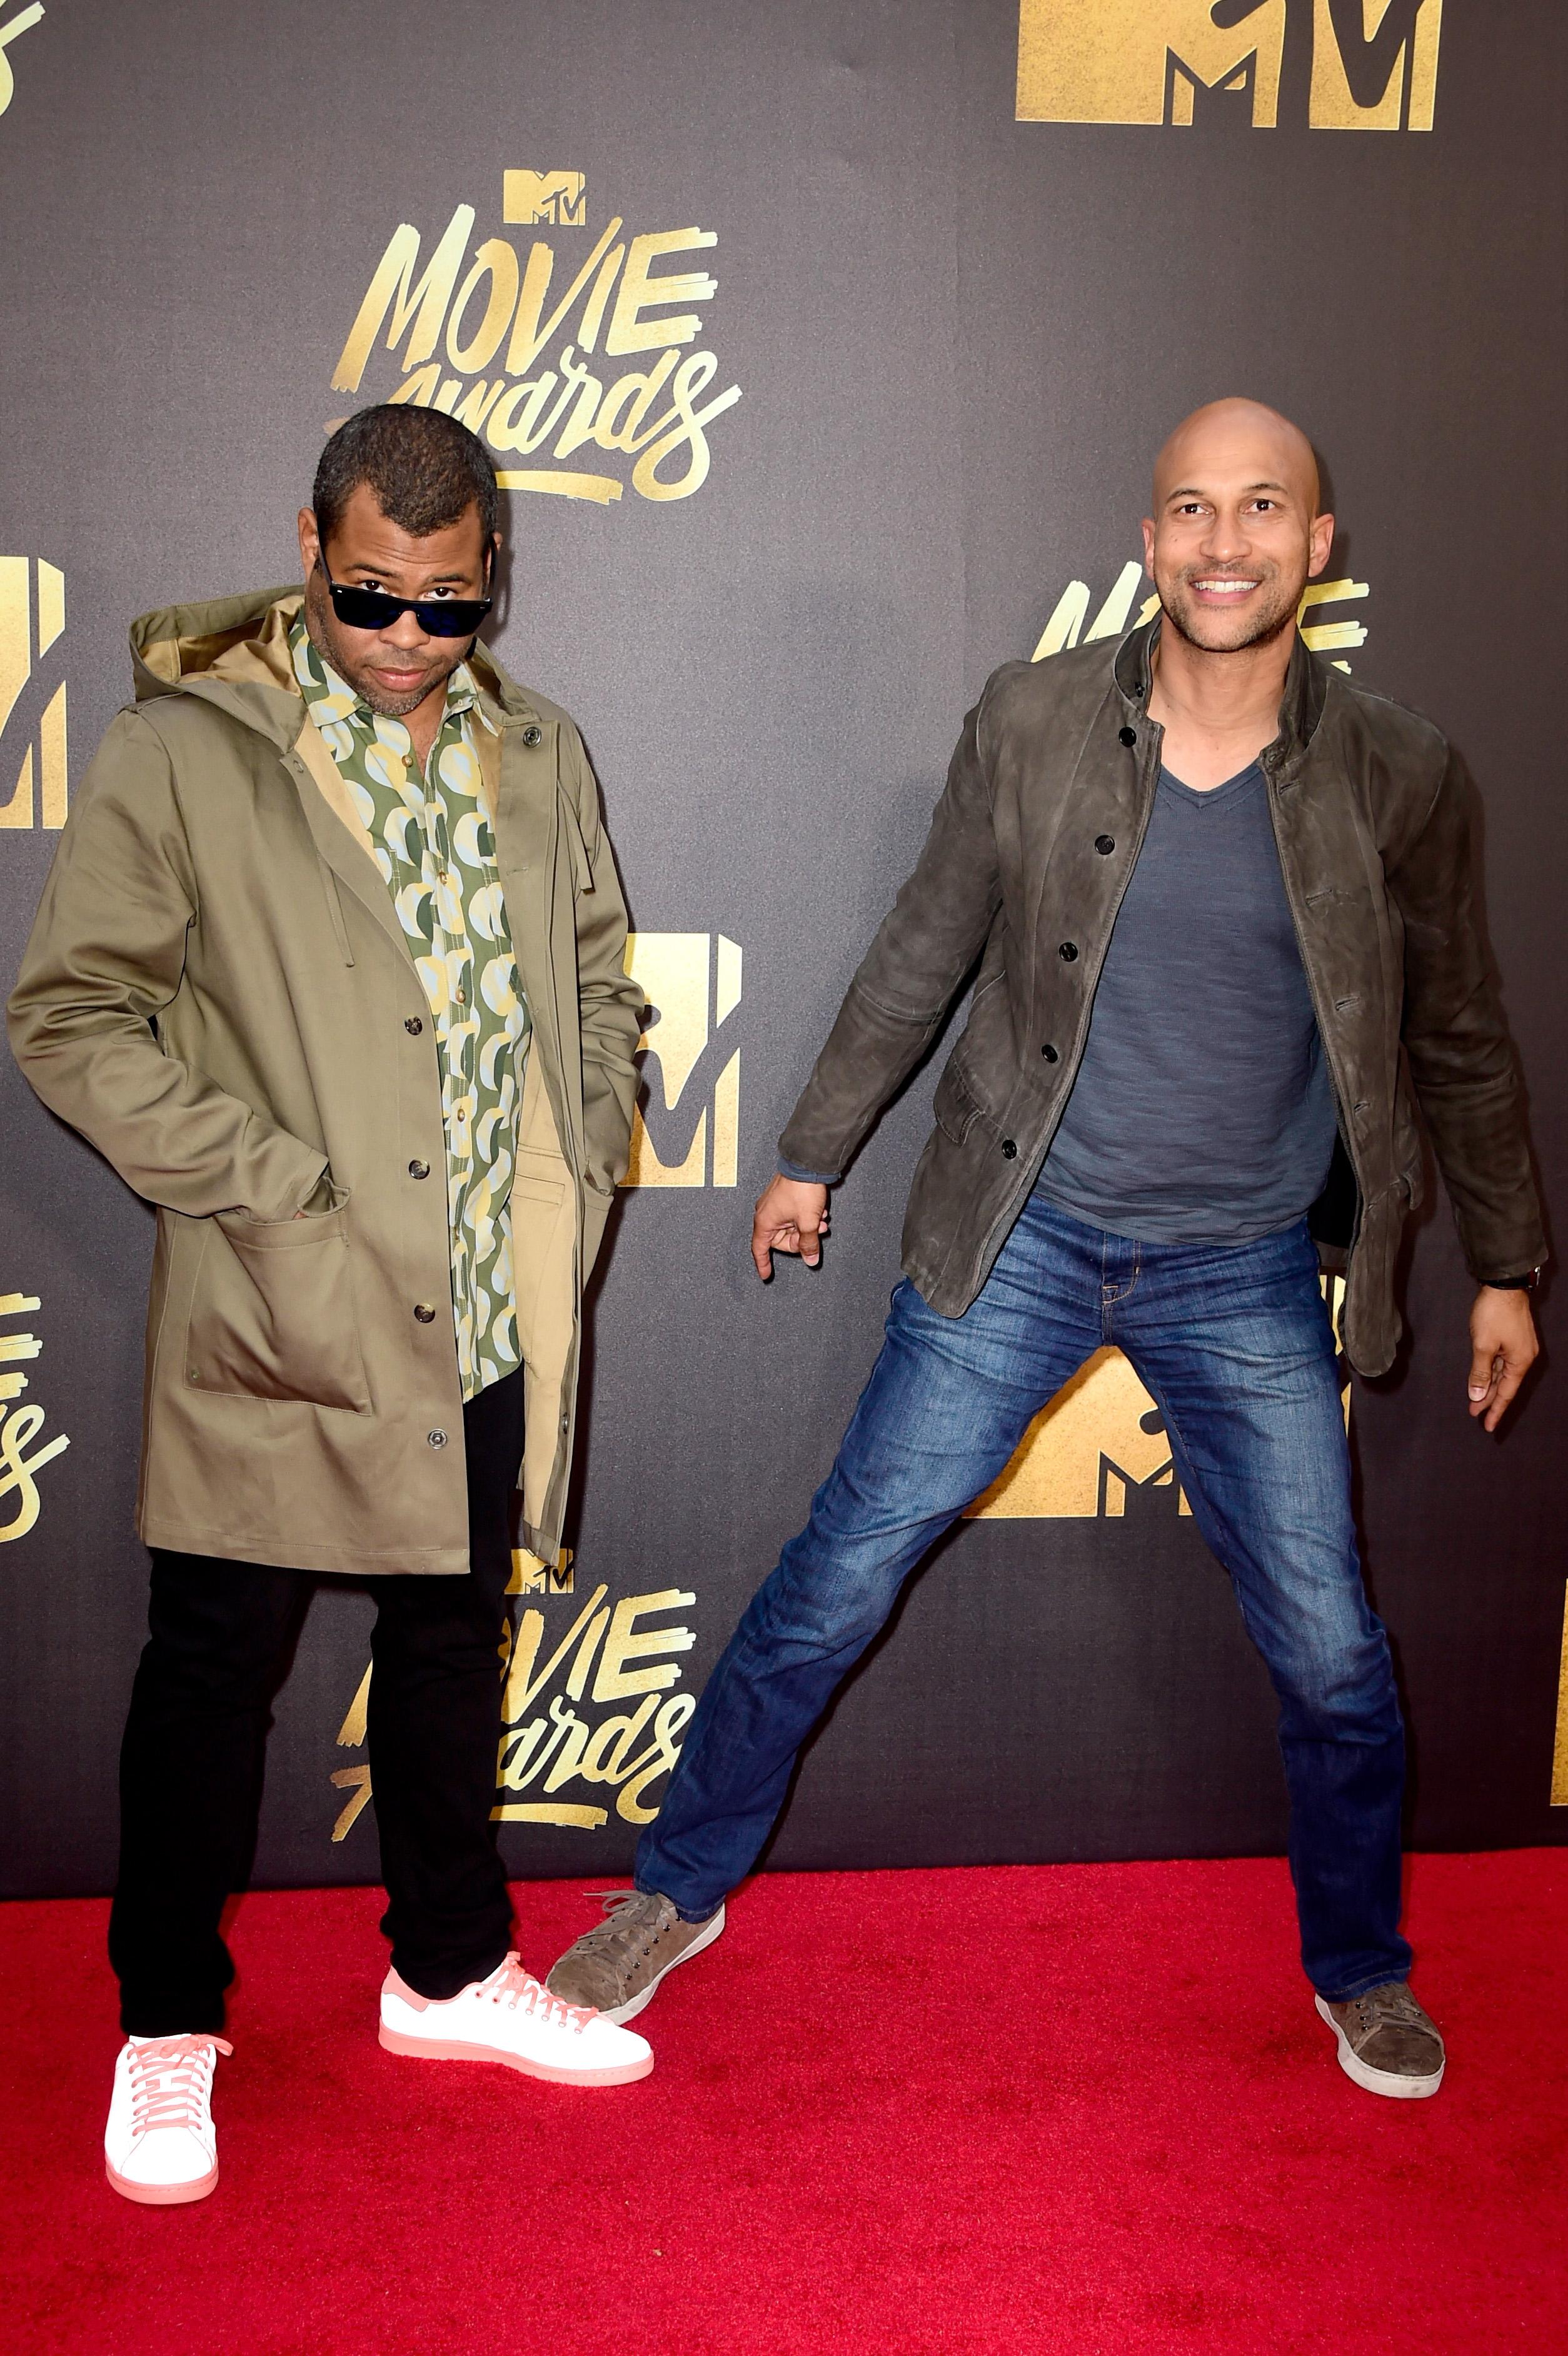 Jordan Peele and Keegan-Michael Key attend the 2016 MTV Movie Awards at Warner Bros. Studios on April 9, 2016 in Burbank, Calif.